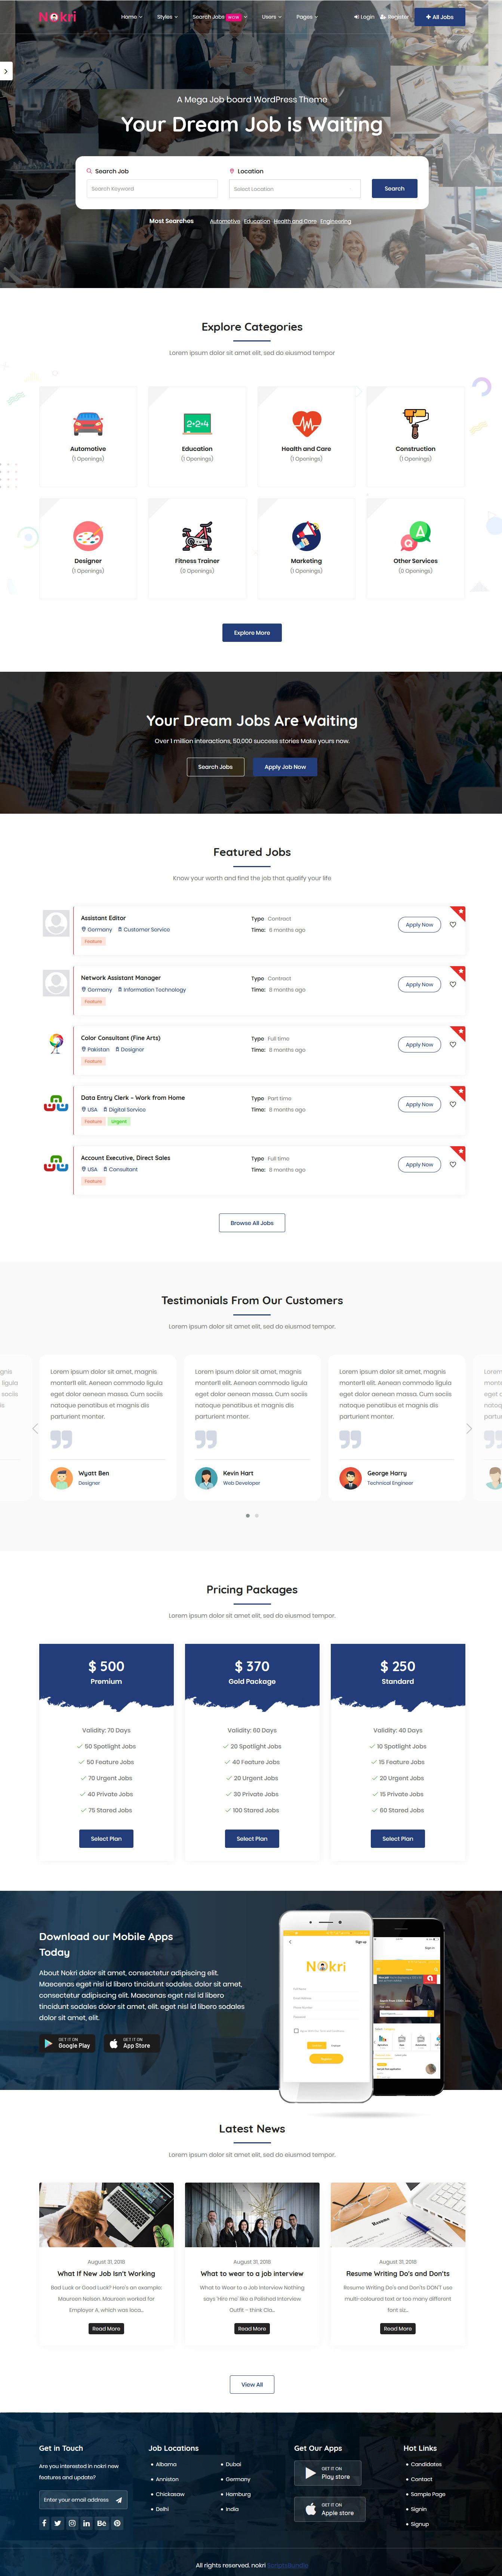 nokri best premium job board wordpress theme - 10+ Best Premium Job Board WordPress Themes